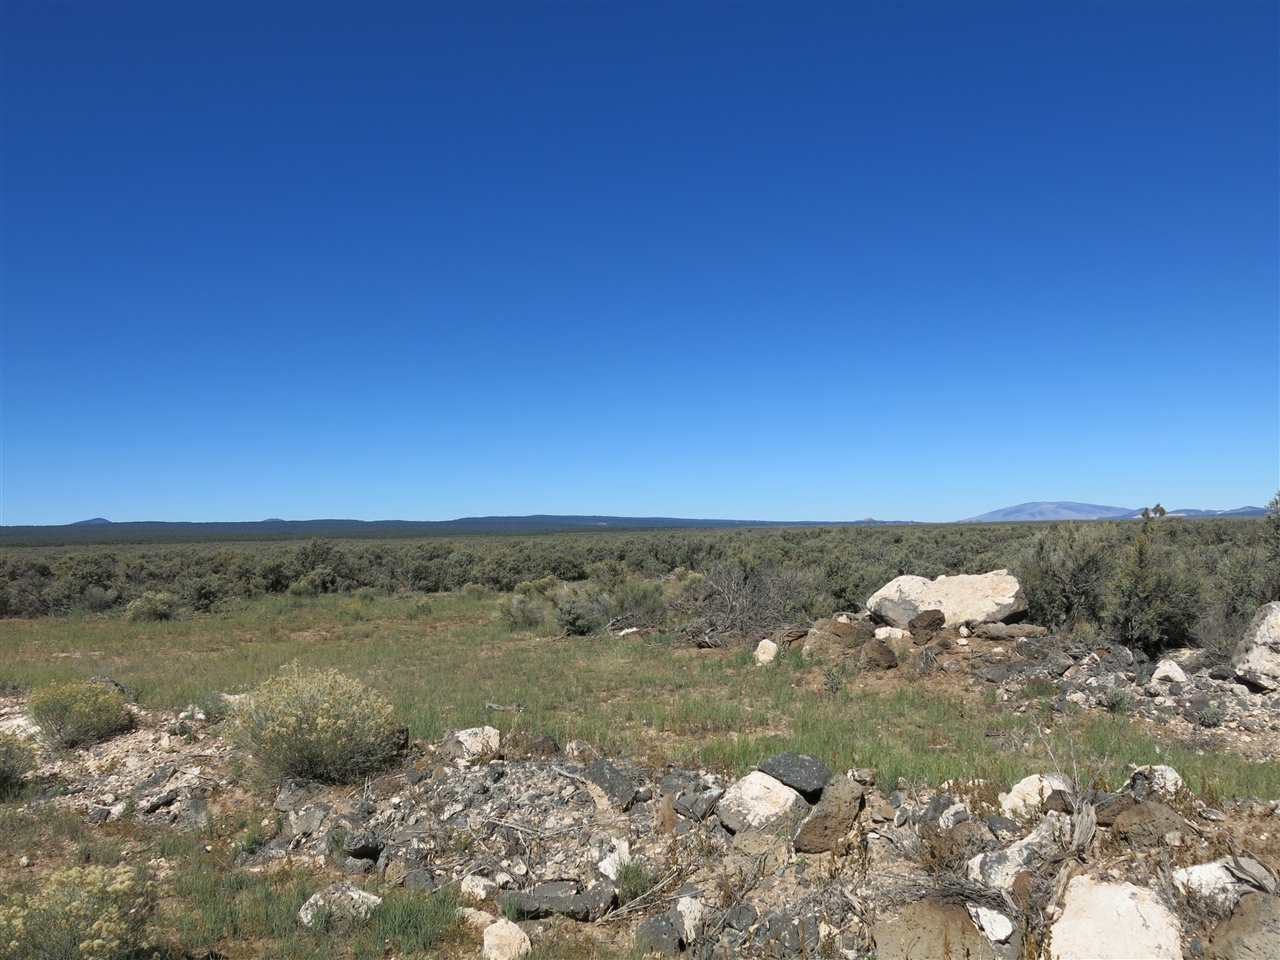 Photo for Lots 5 SERVILLETA SUBD, TRES PIEDRAS, NM 87571 (MLS # 20498)